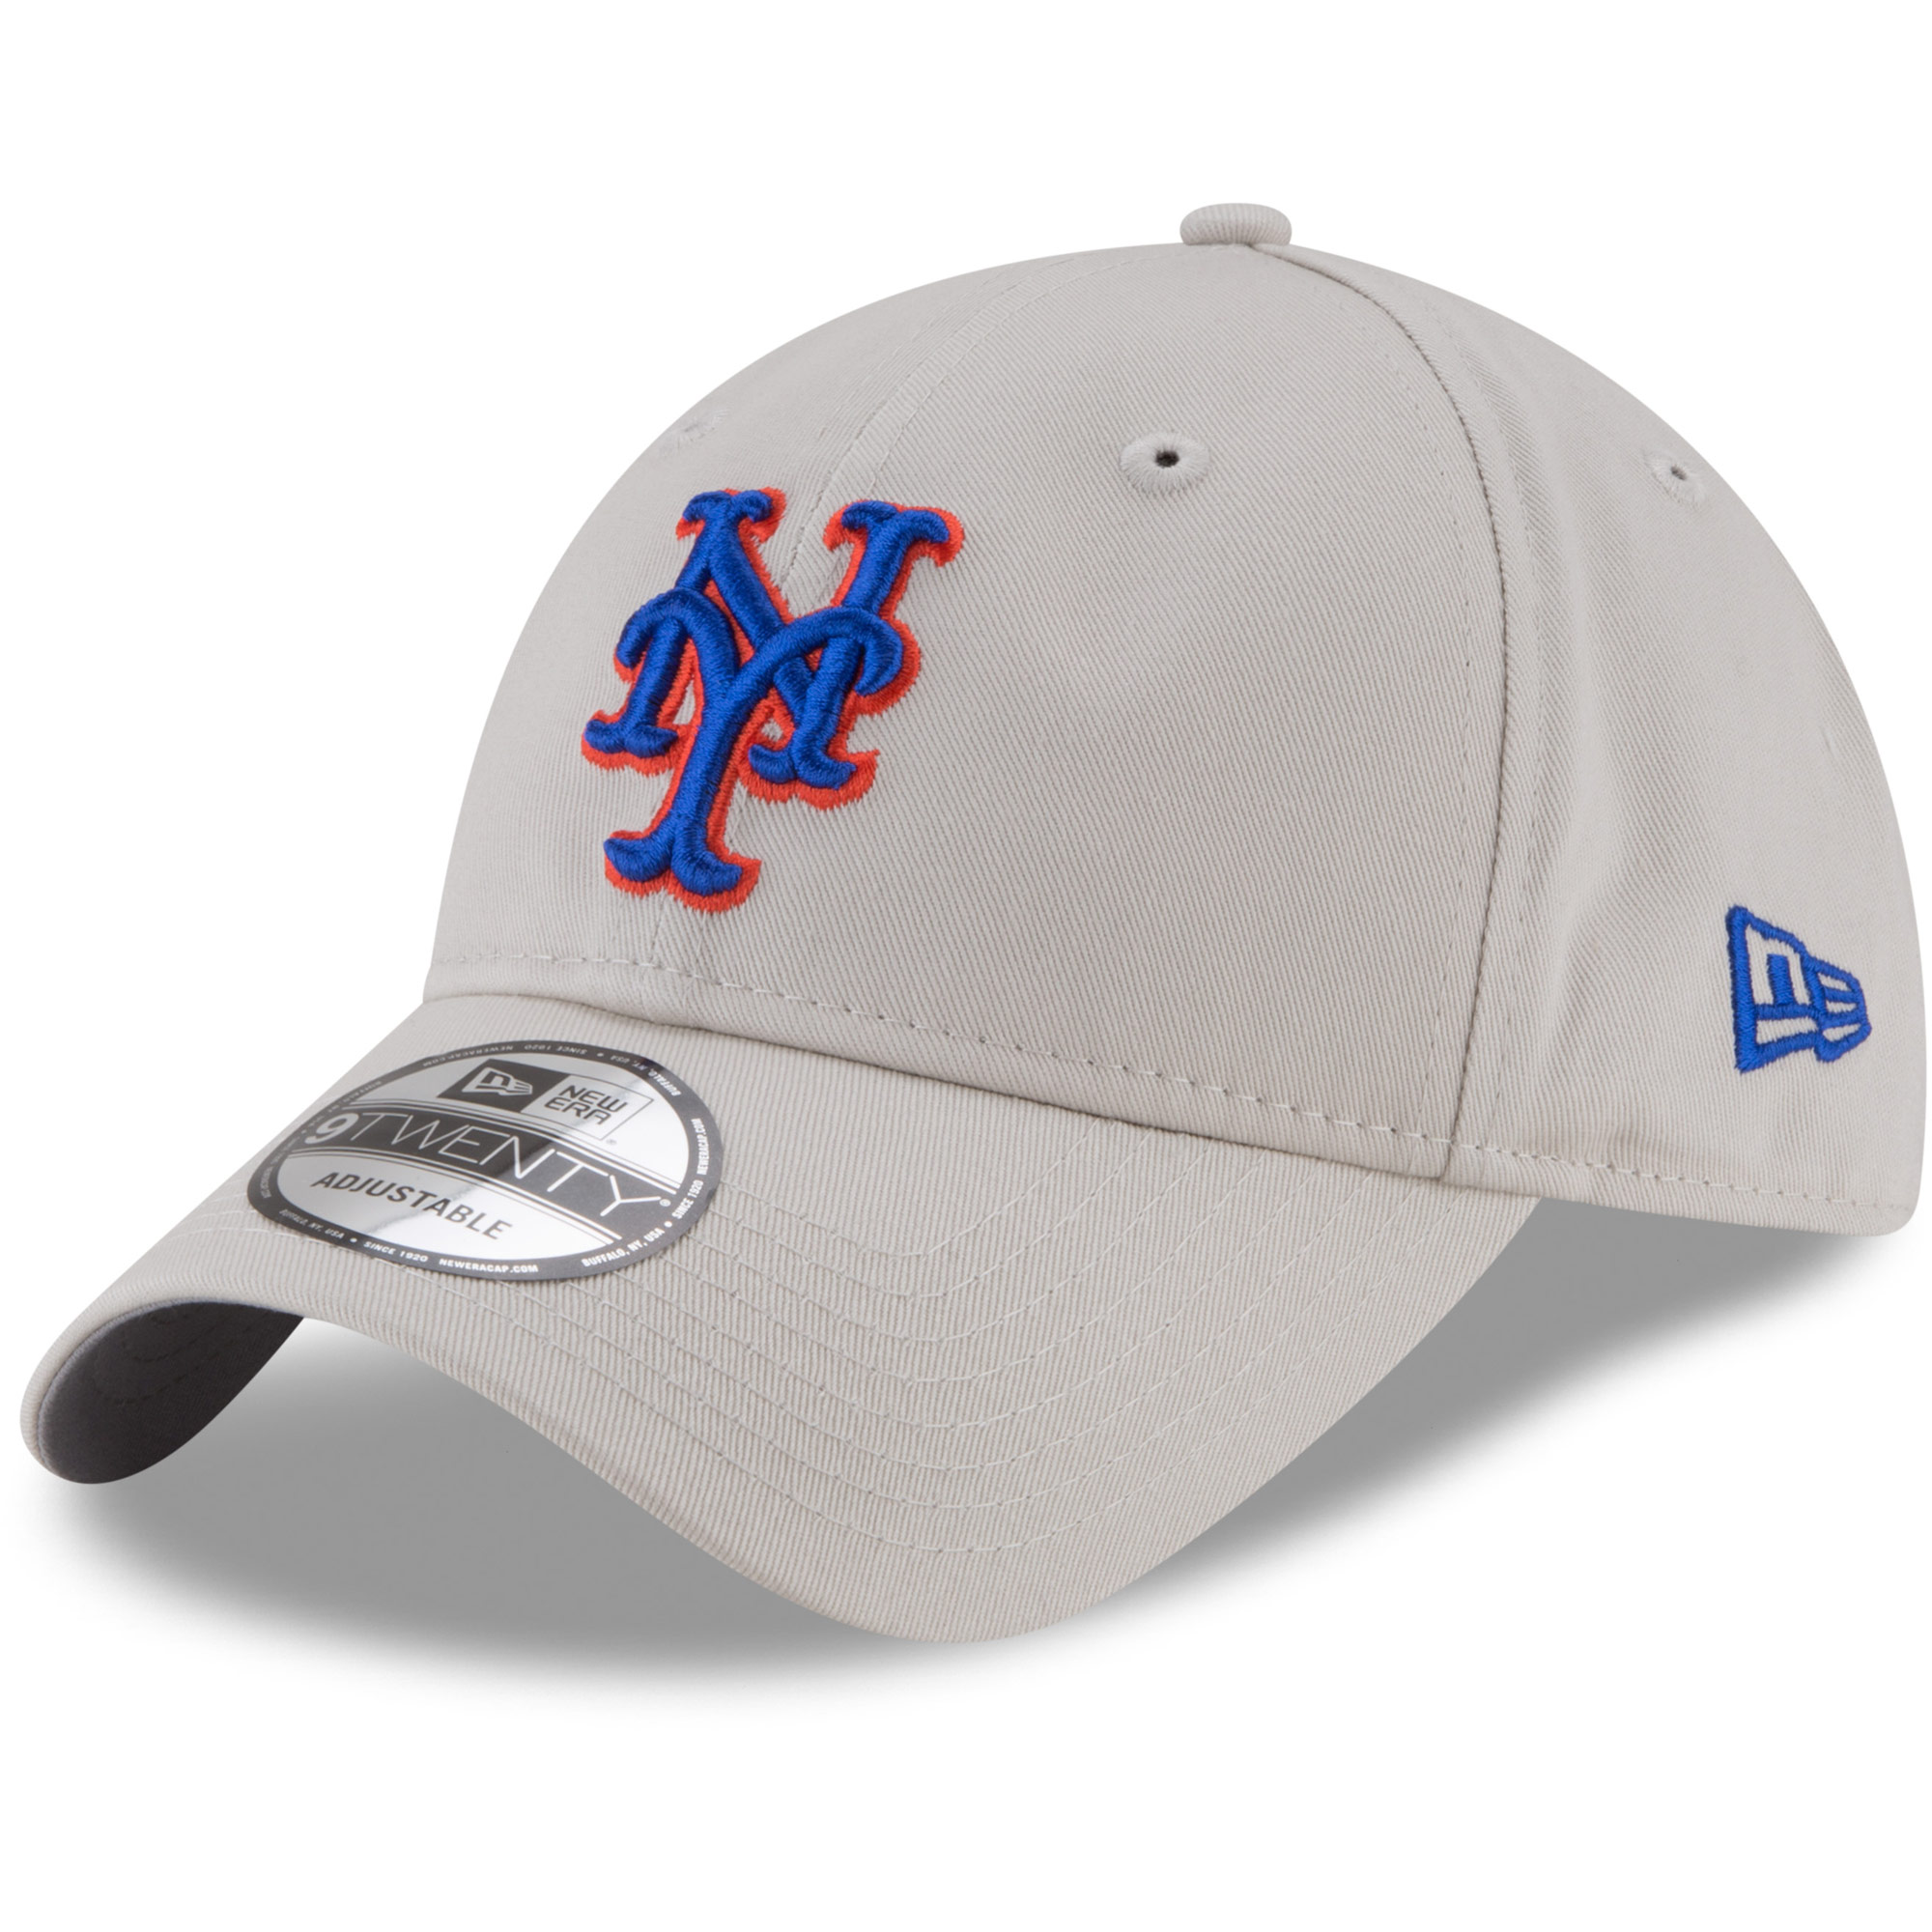 New York Mets New Era 9TWENTY Adjustable Hat - Khaki - OSFA